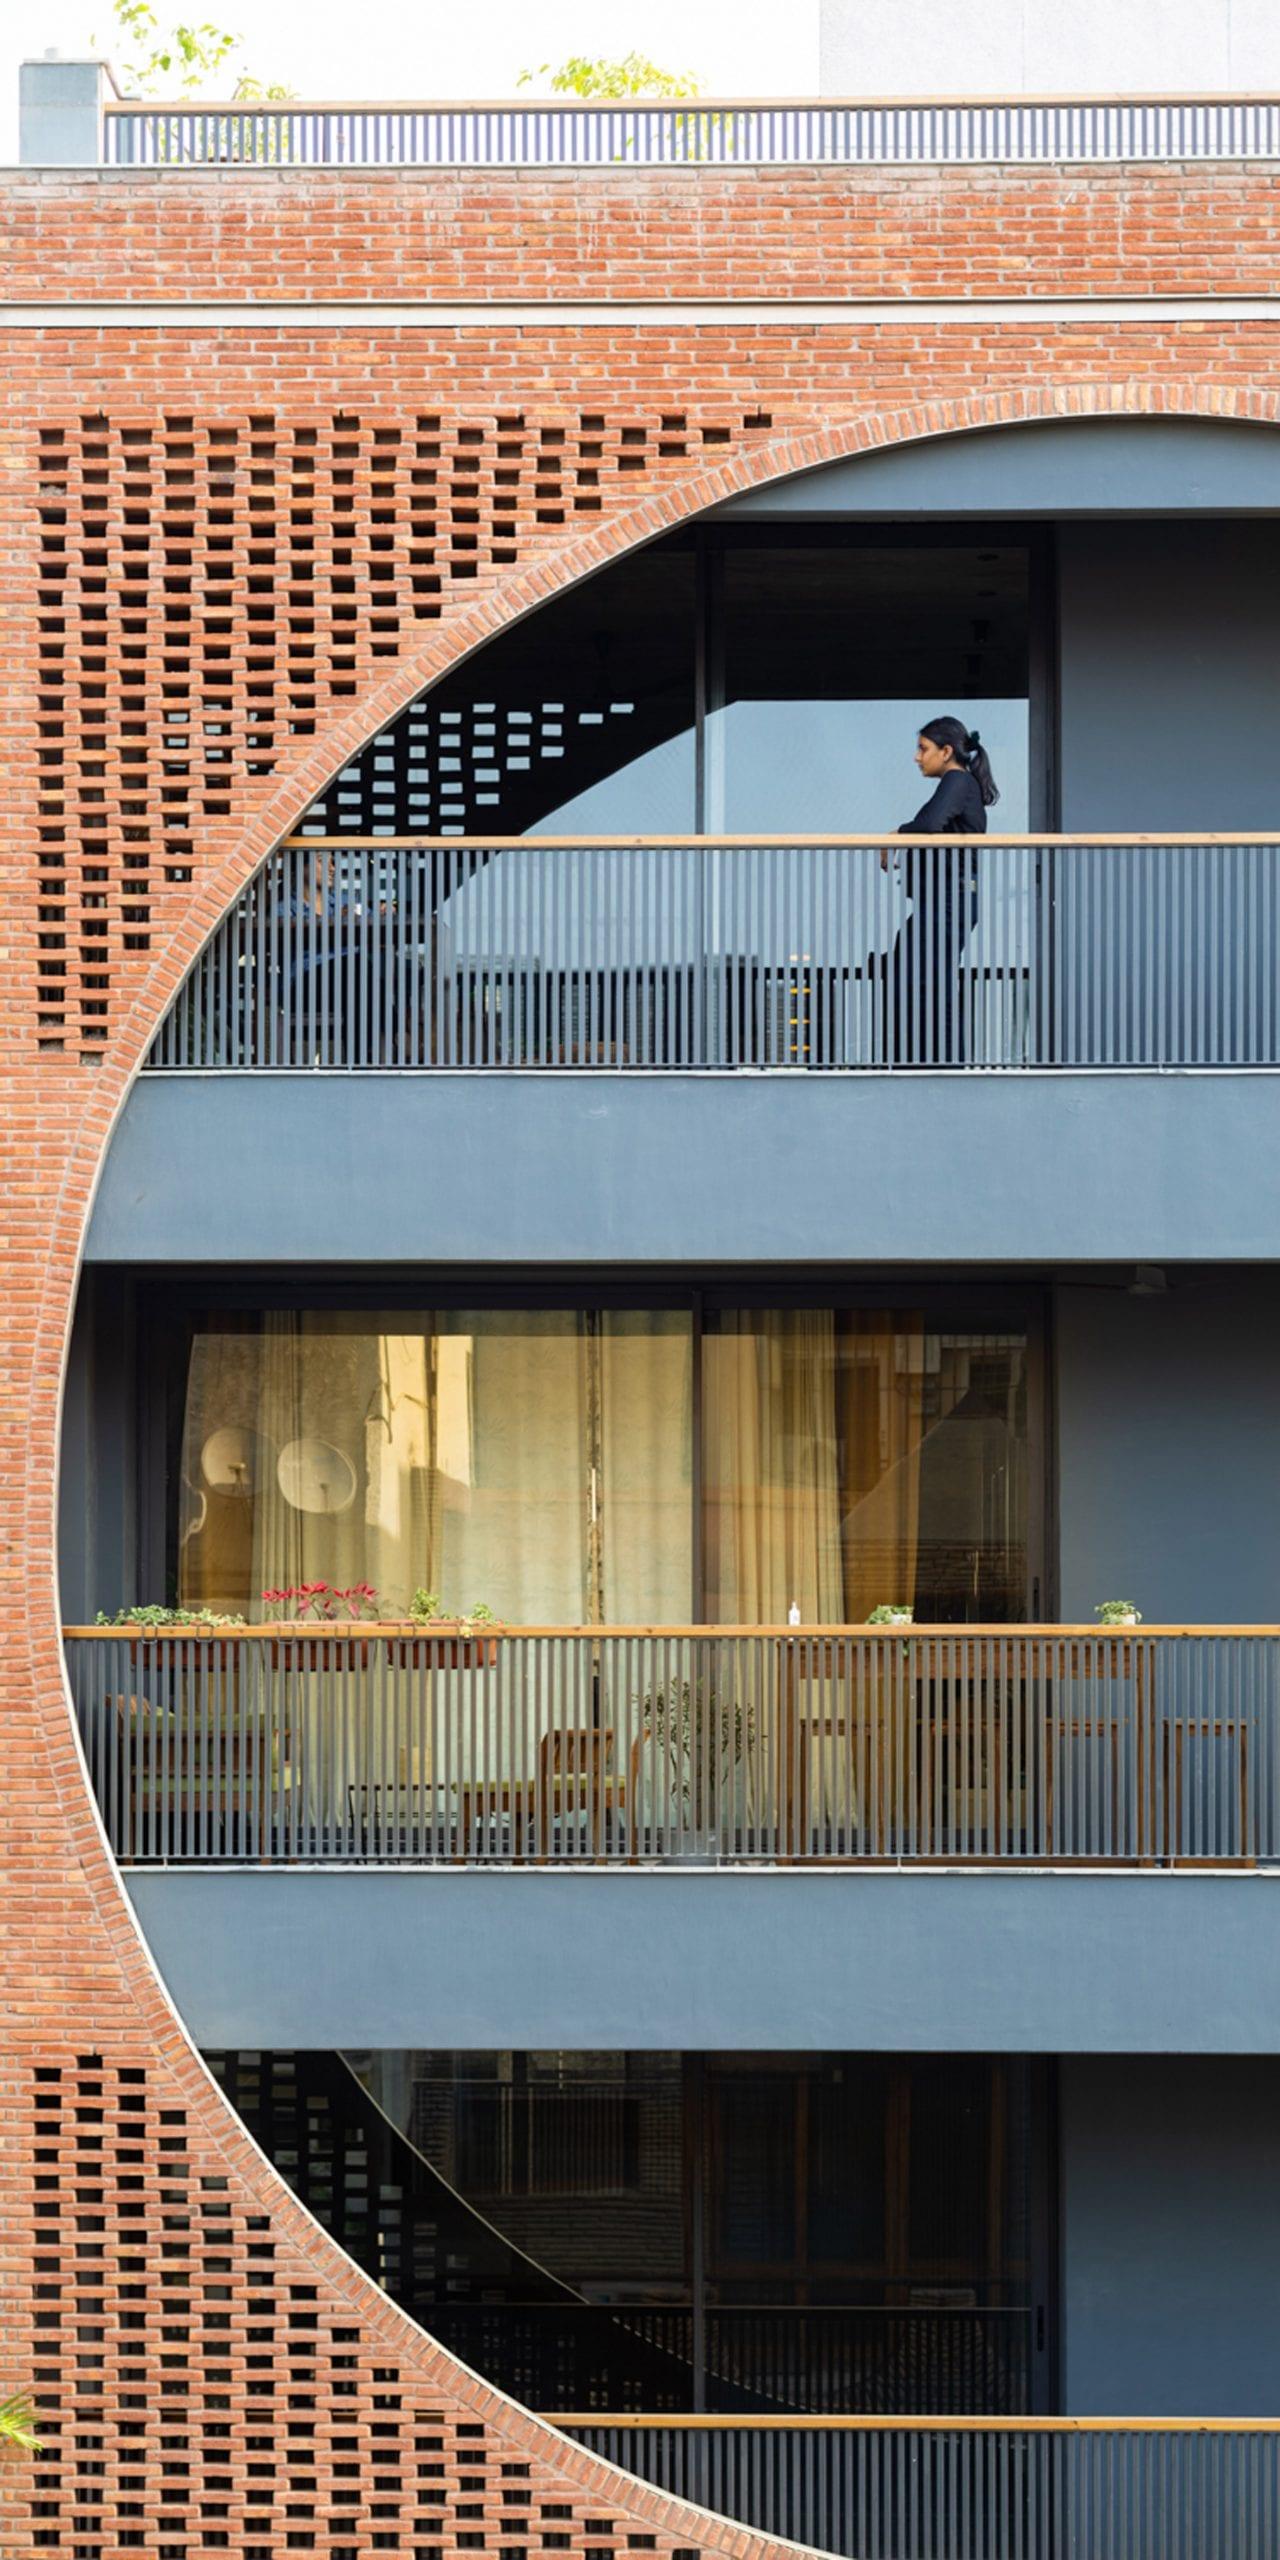 The Safdarjang Residence has a dark grey and brick exterior